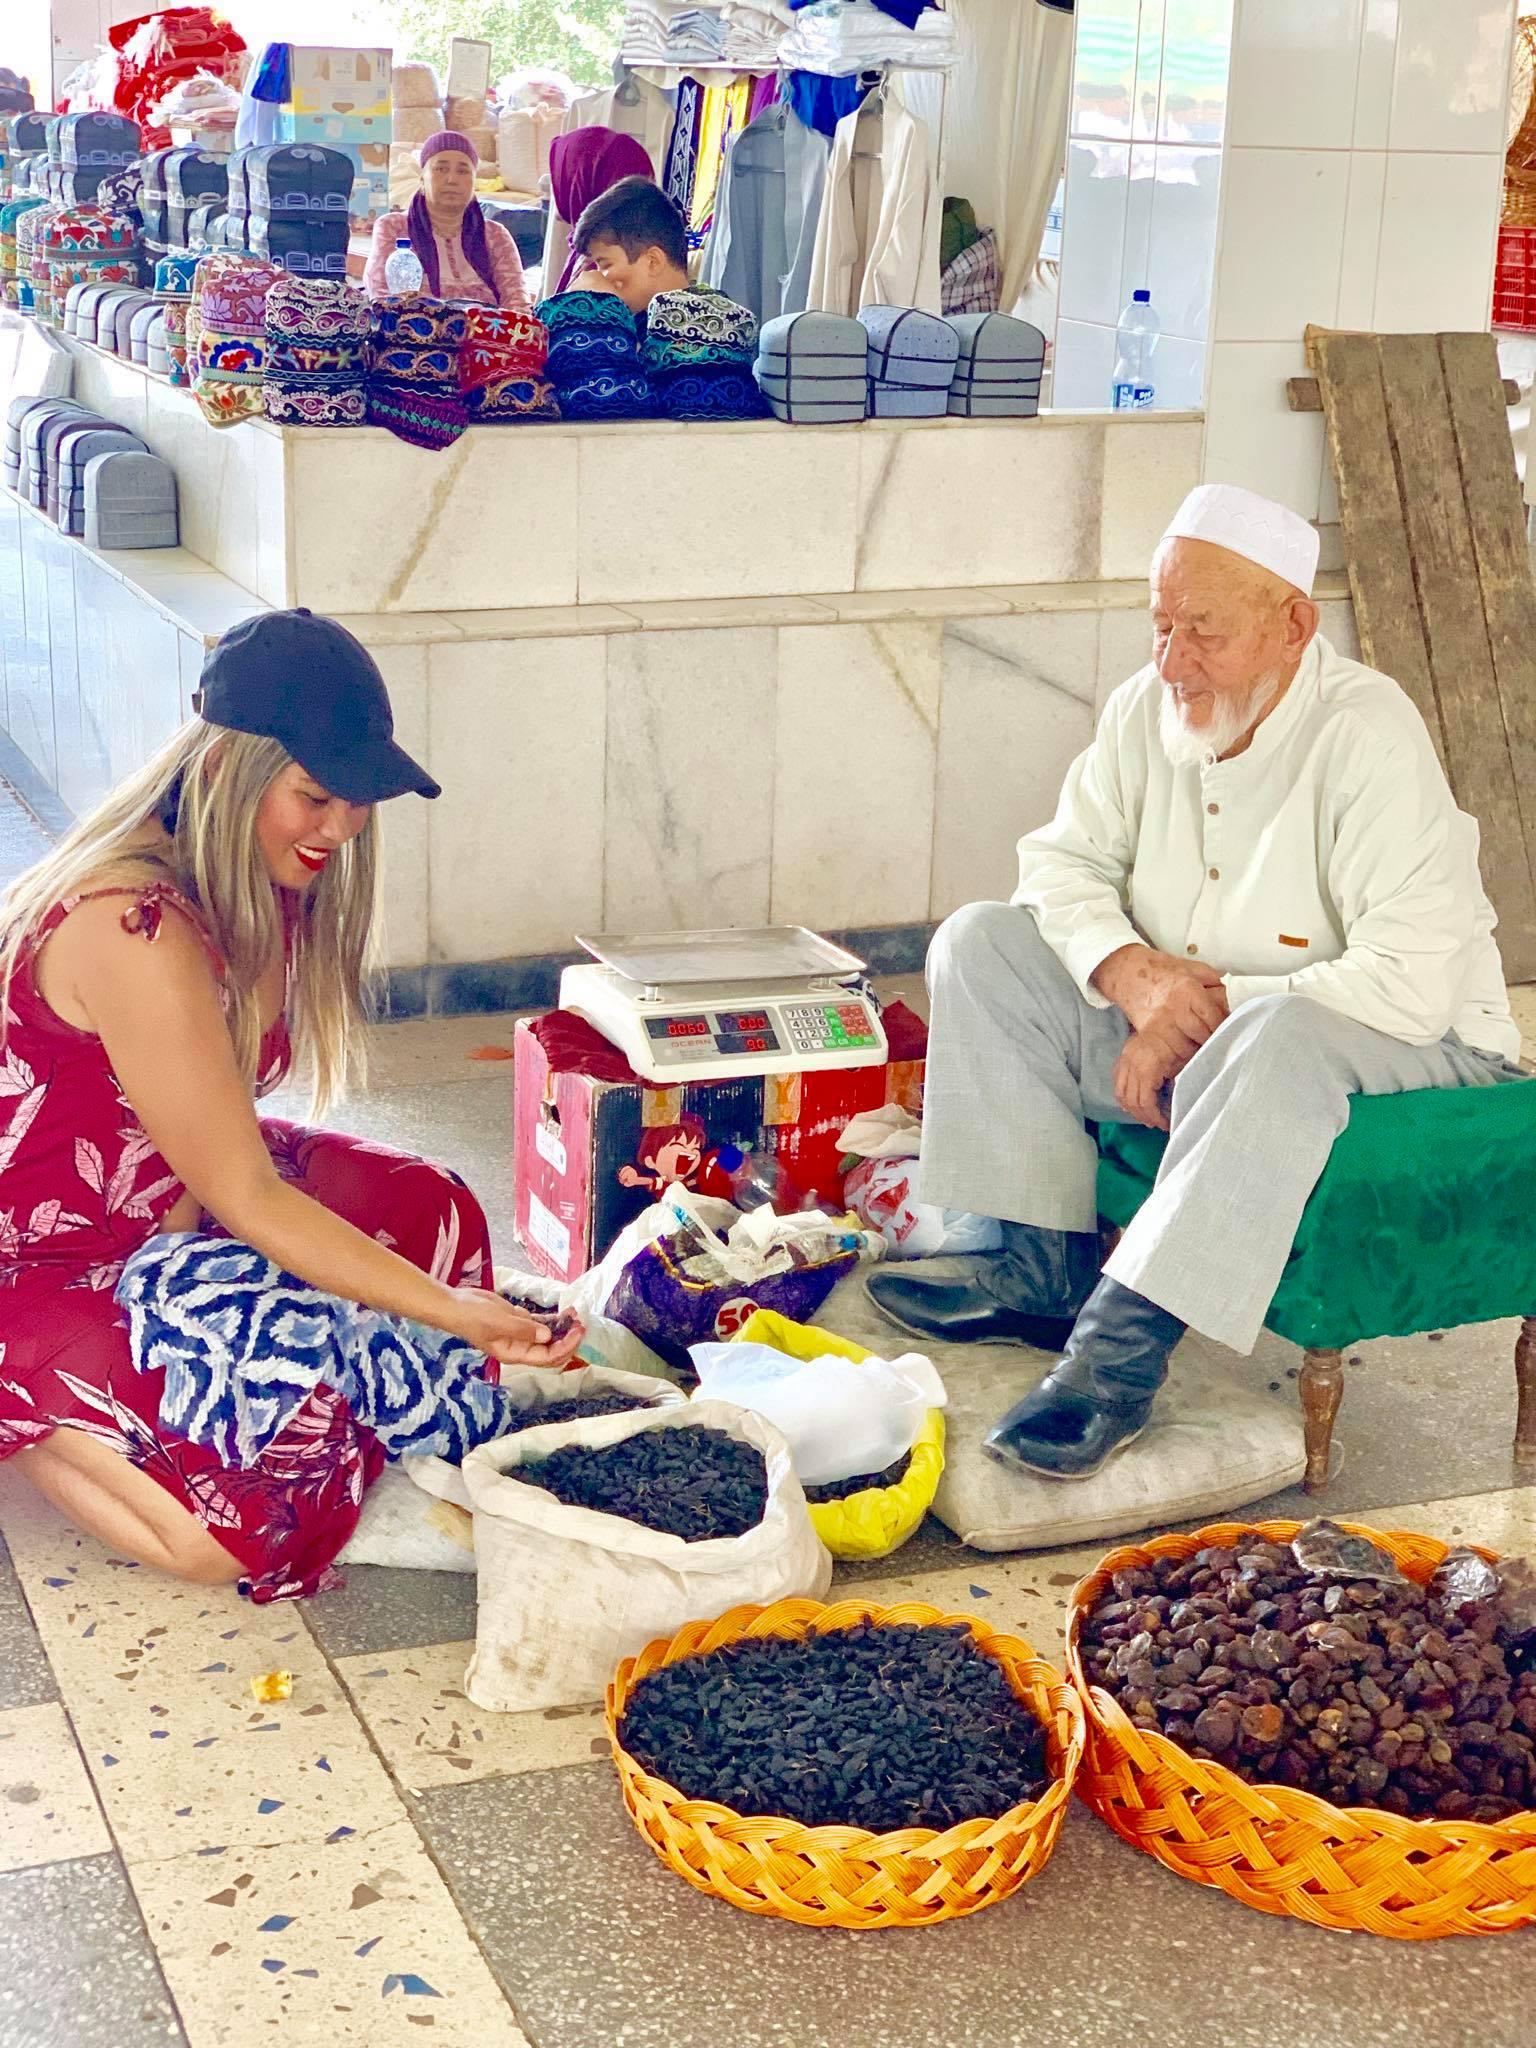 Kach Solo Travels in 2019 Siyab Bazaar and Registan on my first day in Samarkand22.jpg